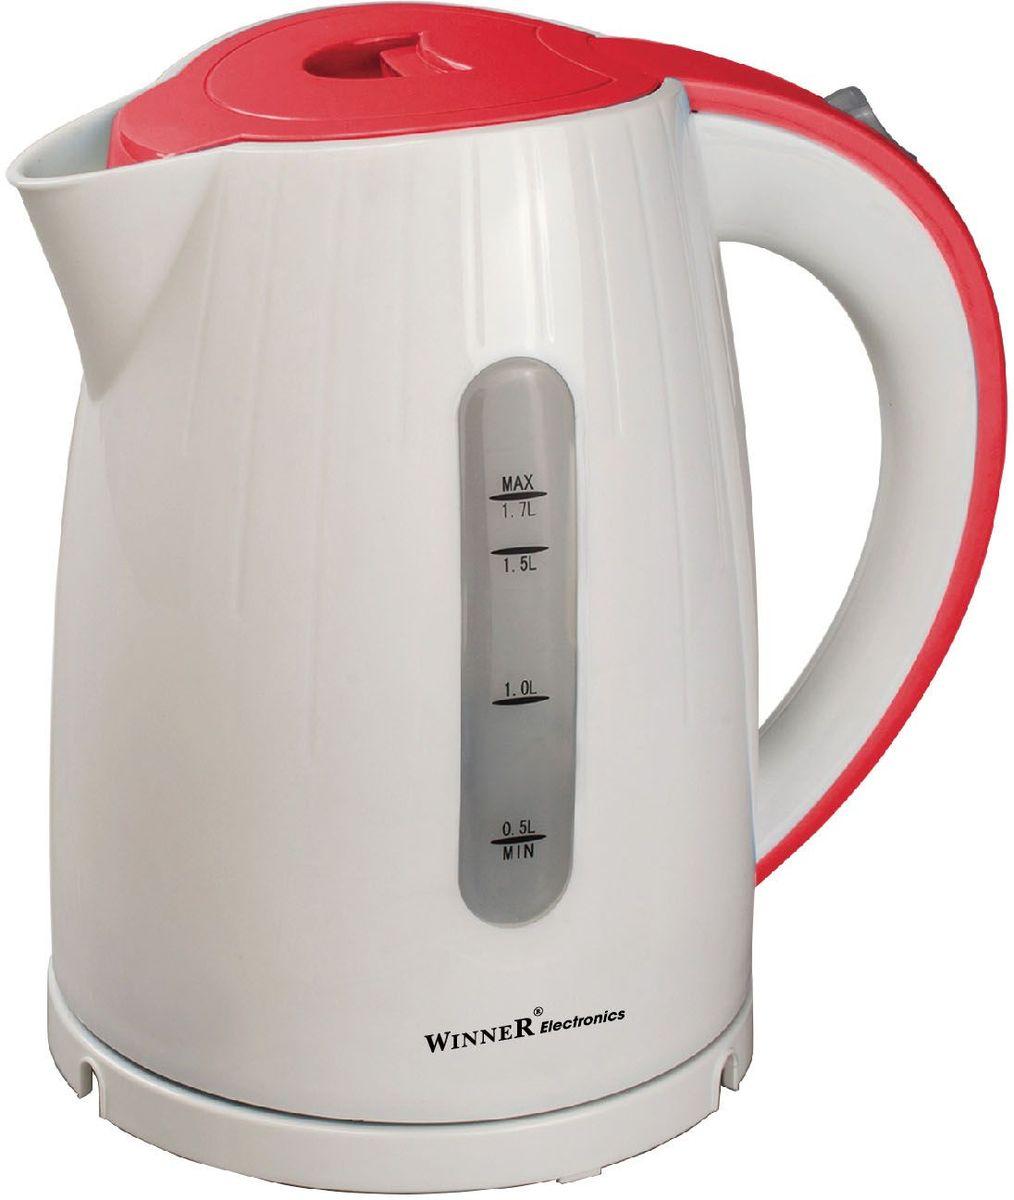 Winner Electronics WR-133 электрический чайник